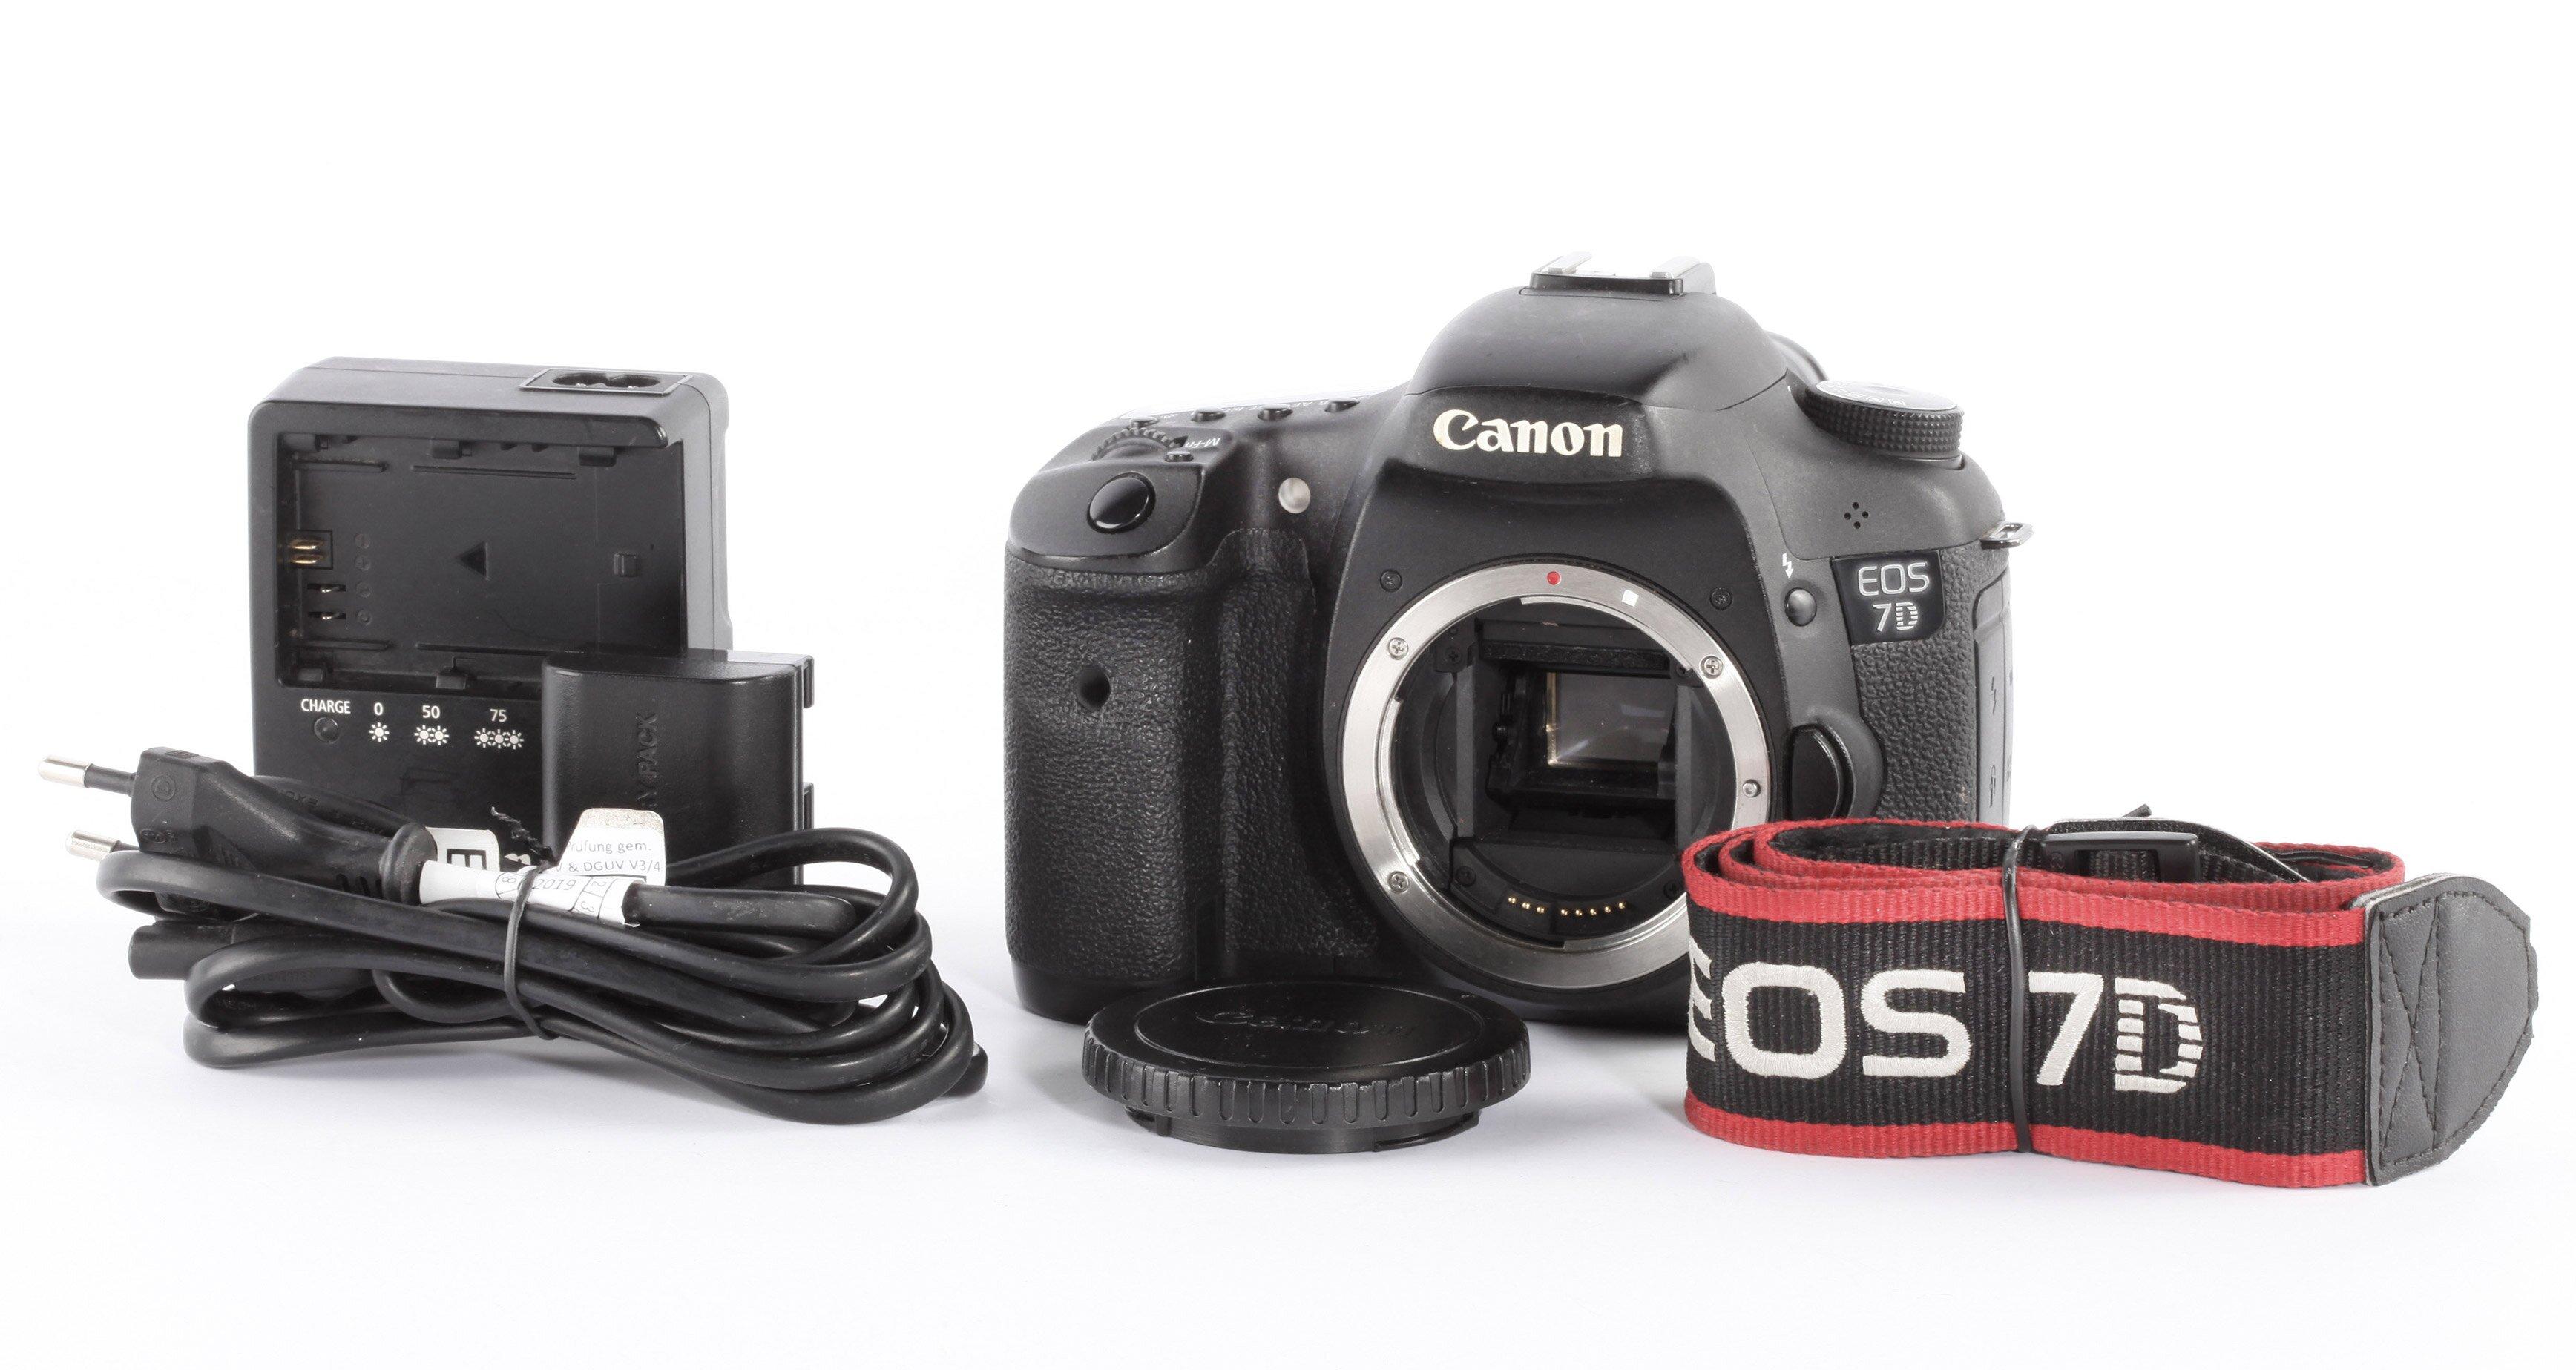 Canon EOS 7D Gehäuse 30100 Auslösungen